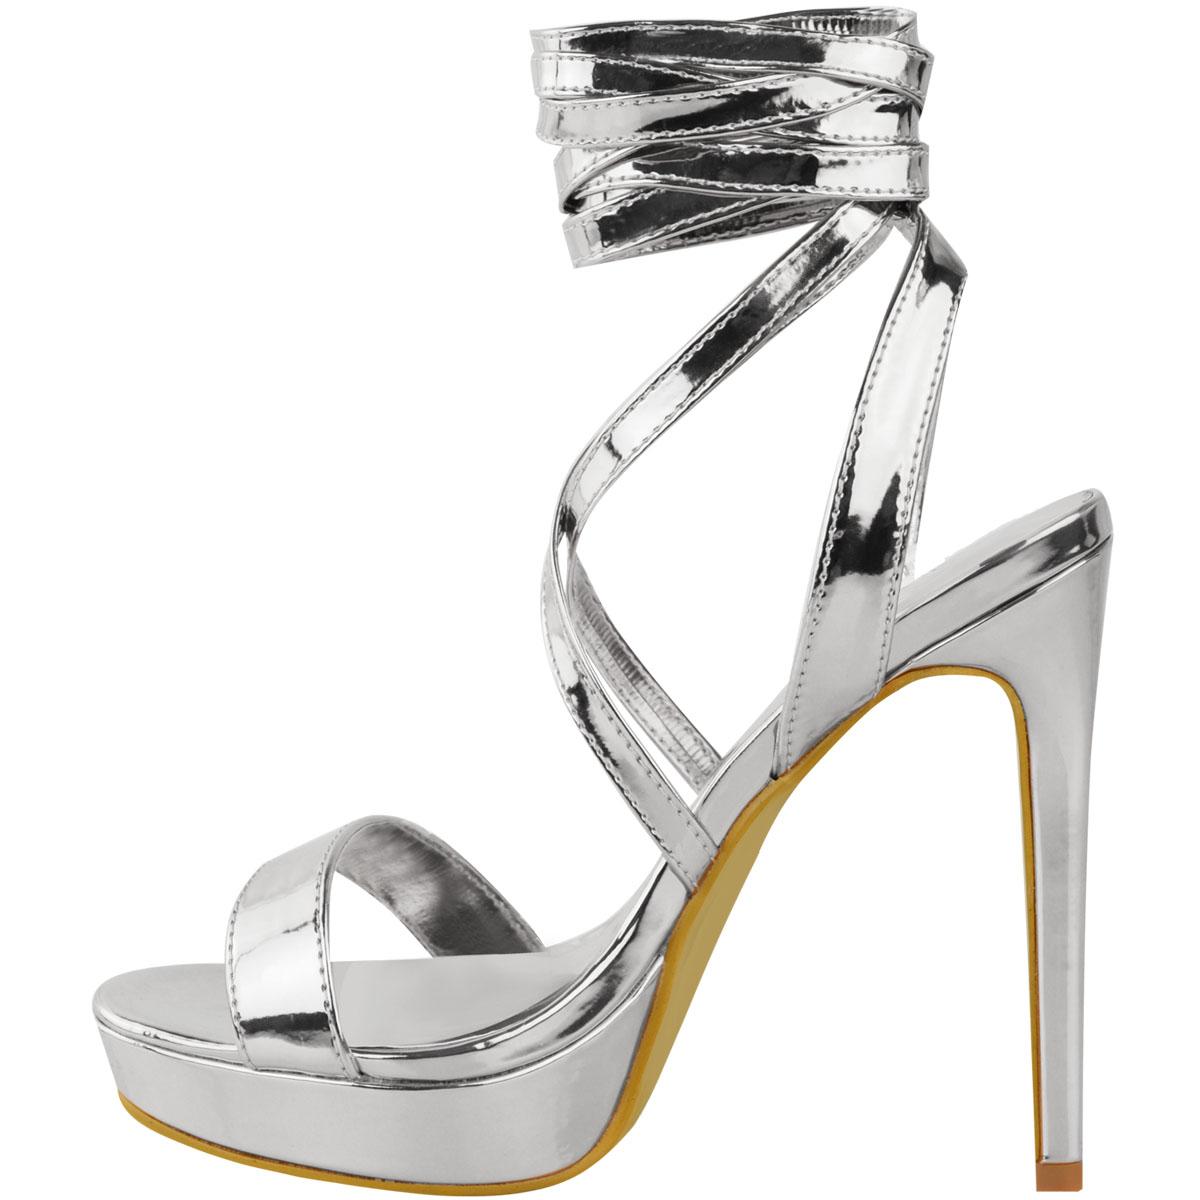 Womens-Ladies-Stilettos-High-Heels-Strappy-Platforms-Sandals-Diamante-Shoes-Size thumbnail 48